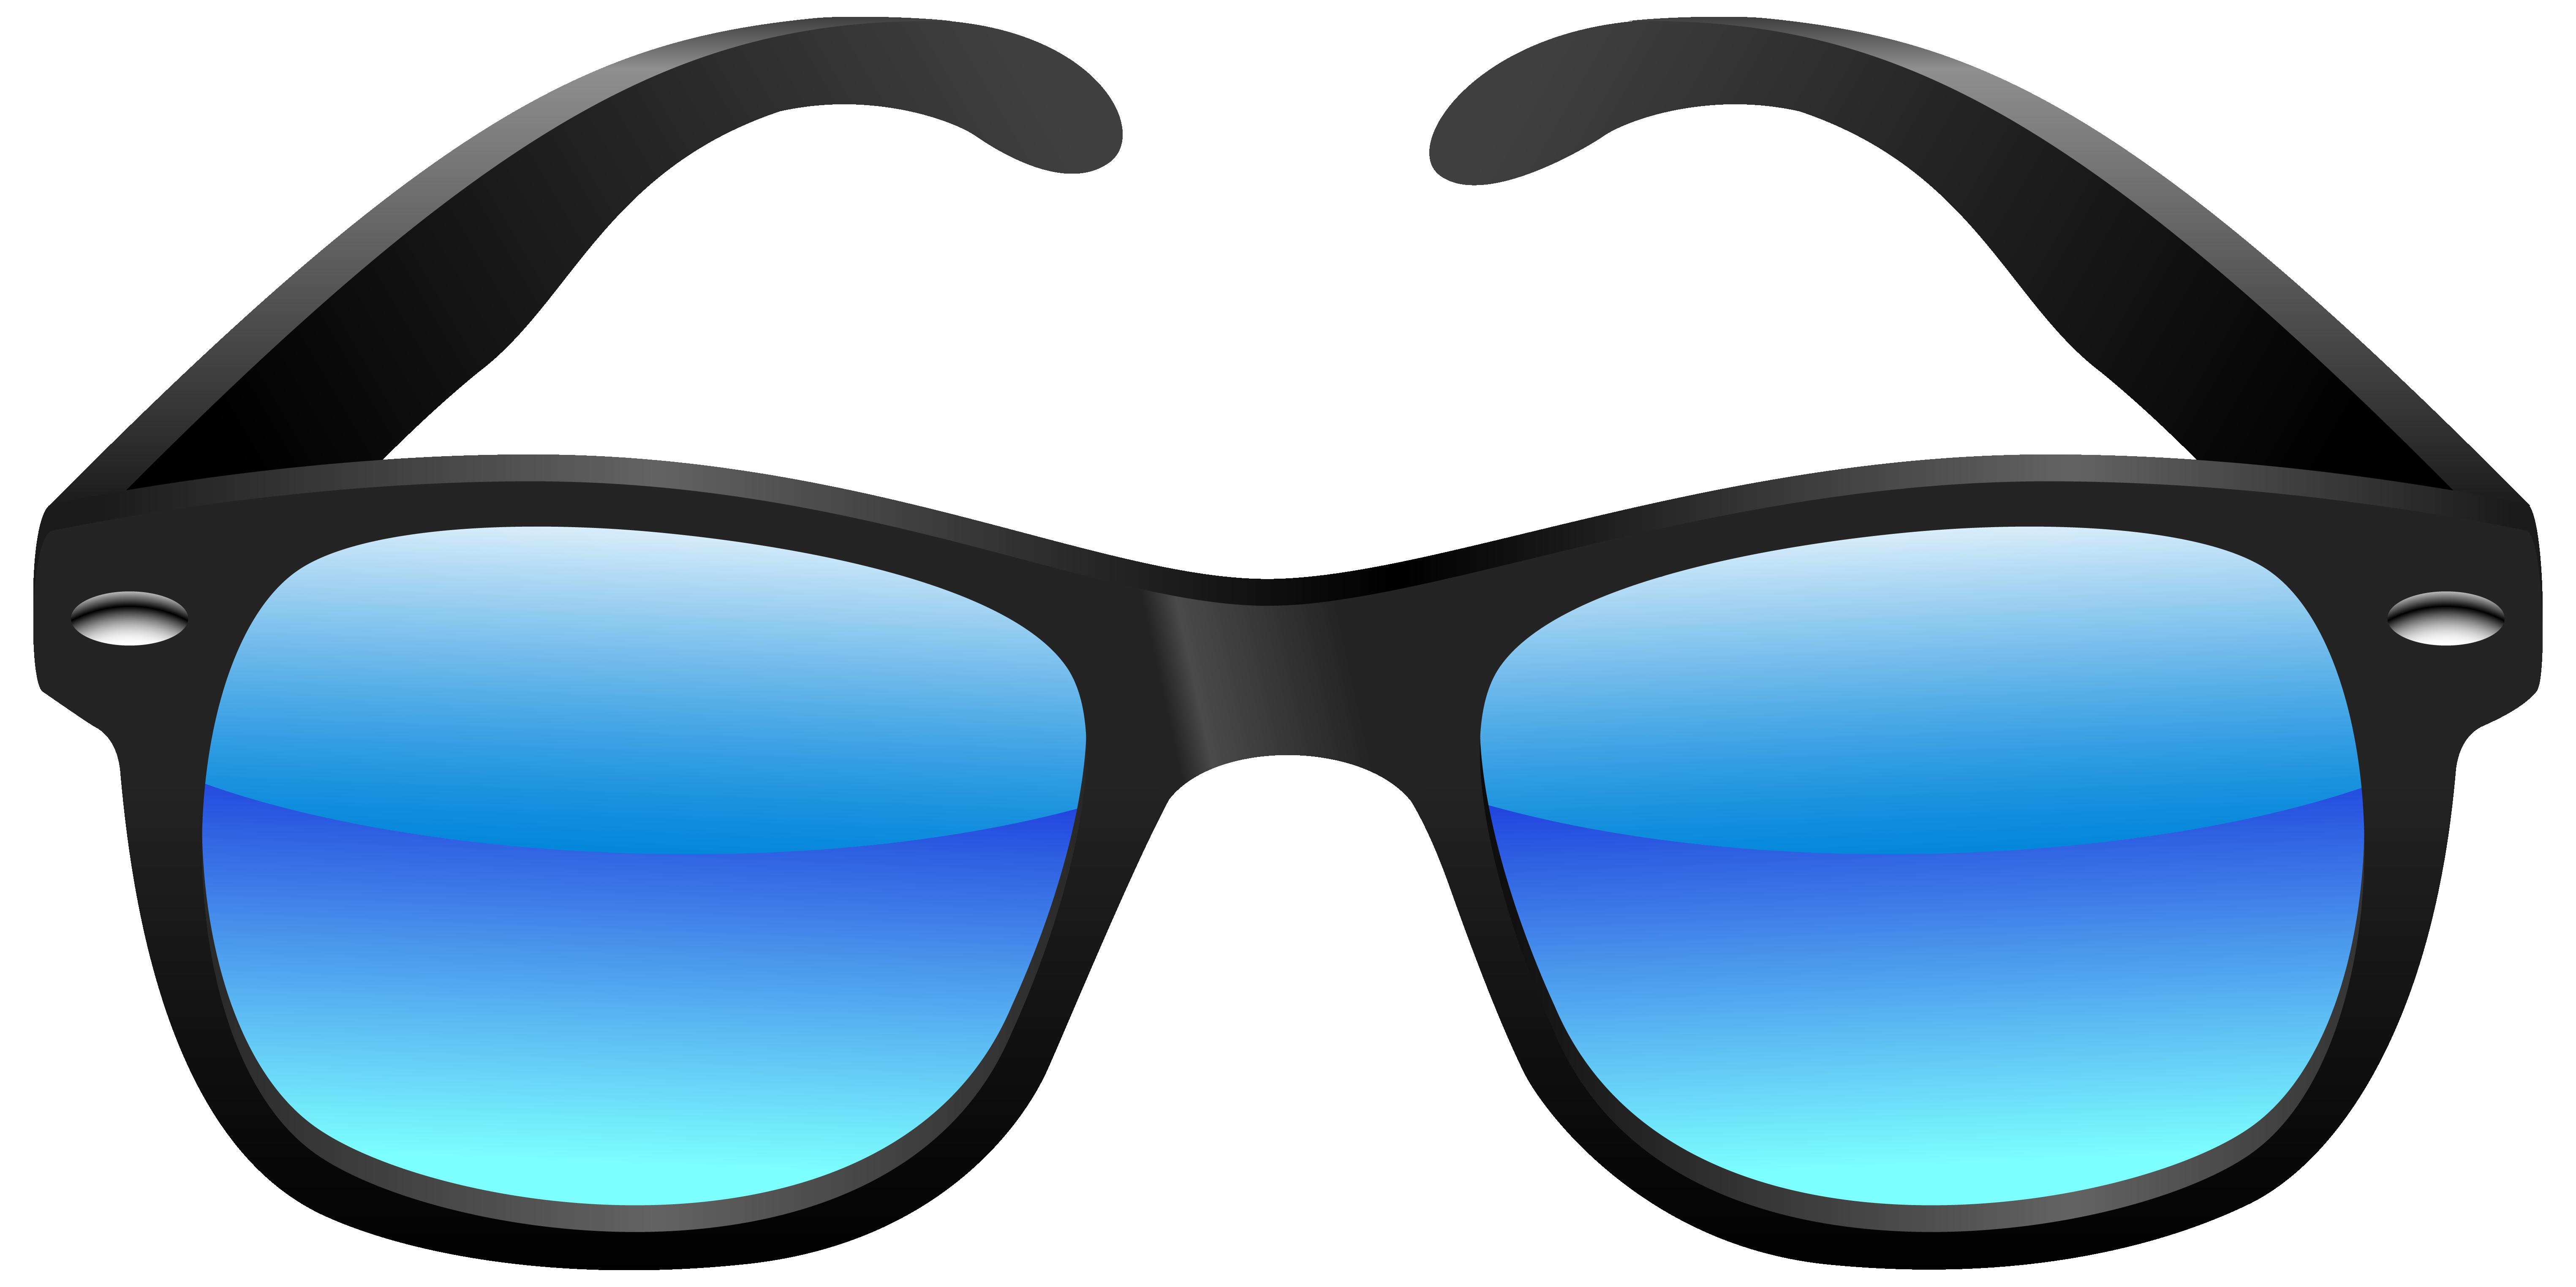 Black And Blue Sunglasses Clipart Image-Black and blue sunglasses clipart image-2